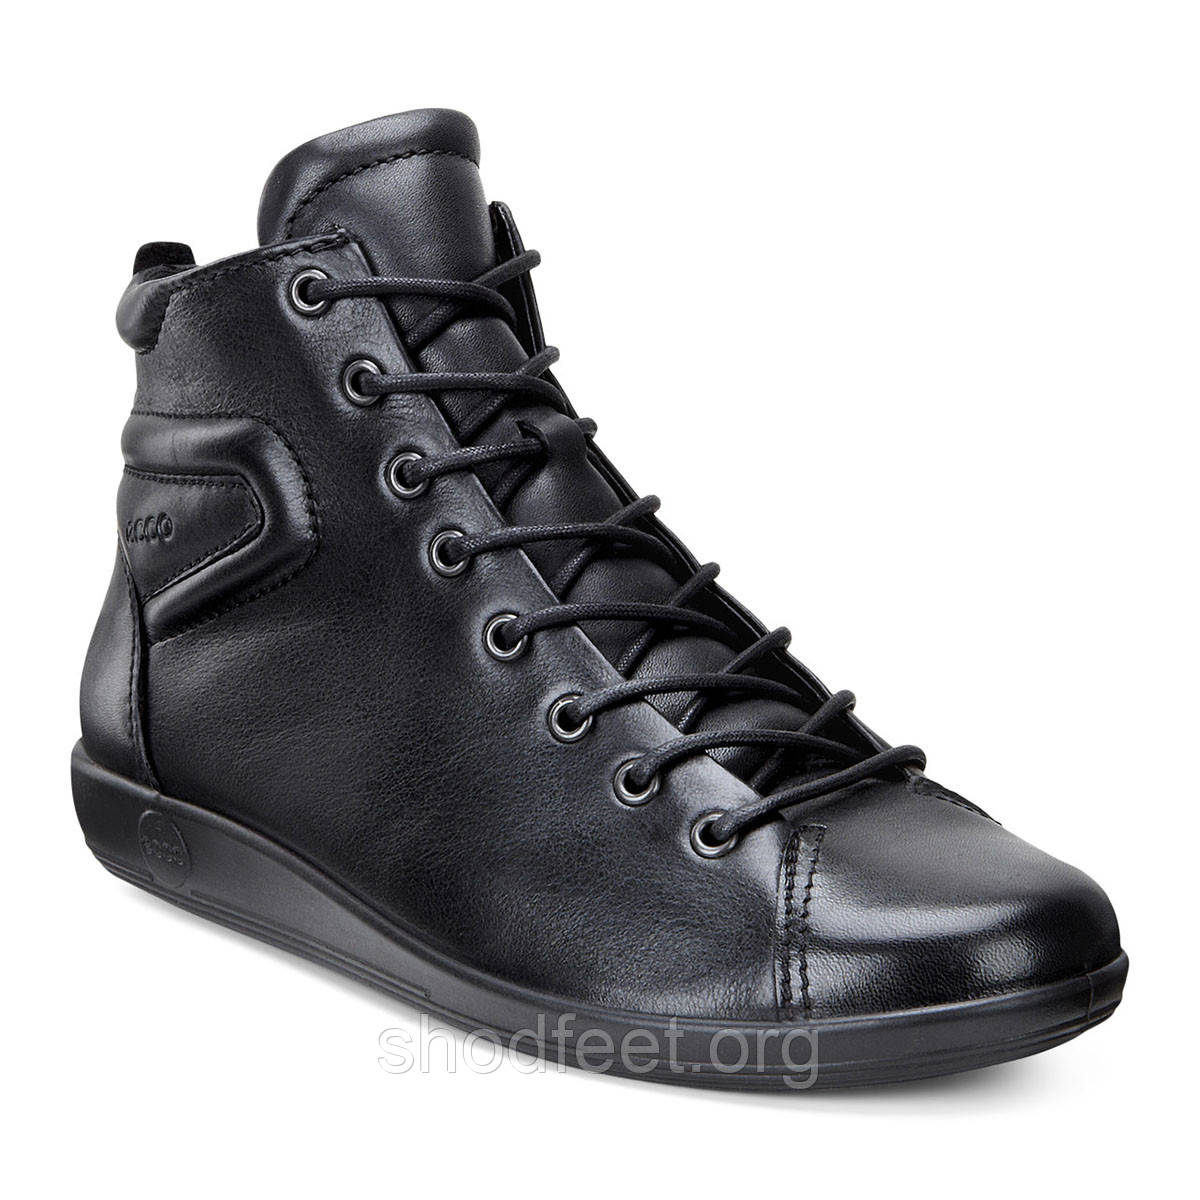 Женские ботинки Ecco Soft 2.0 206523-56723